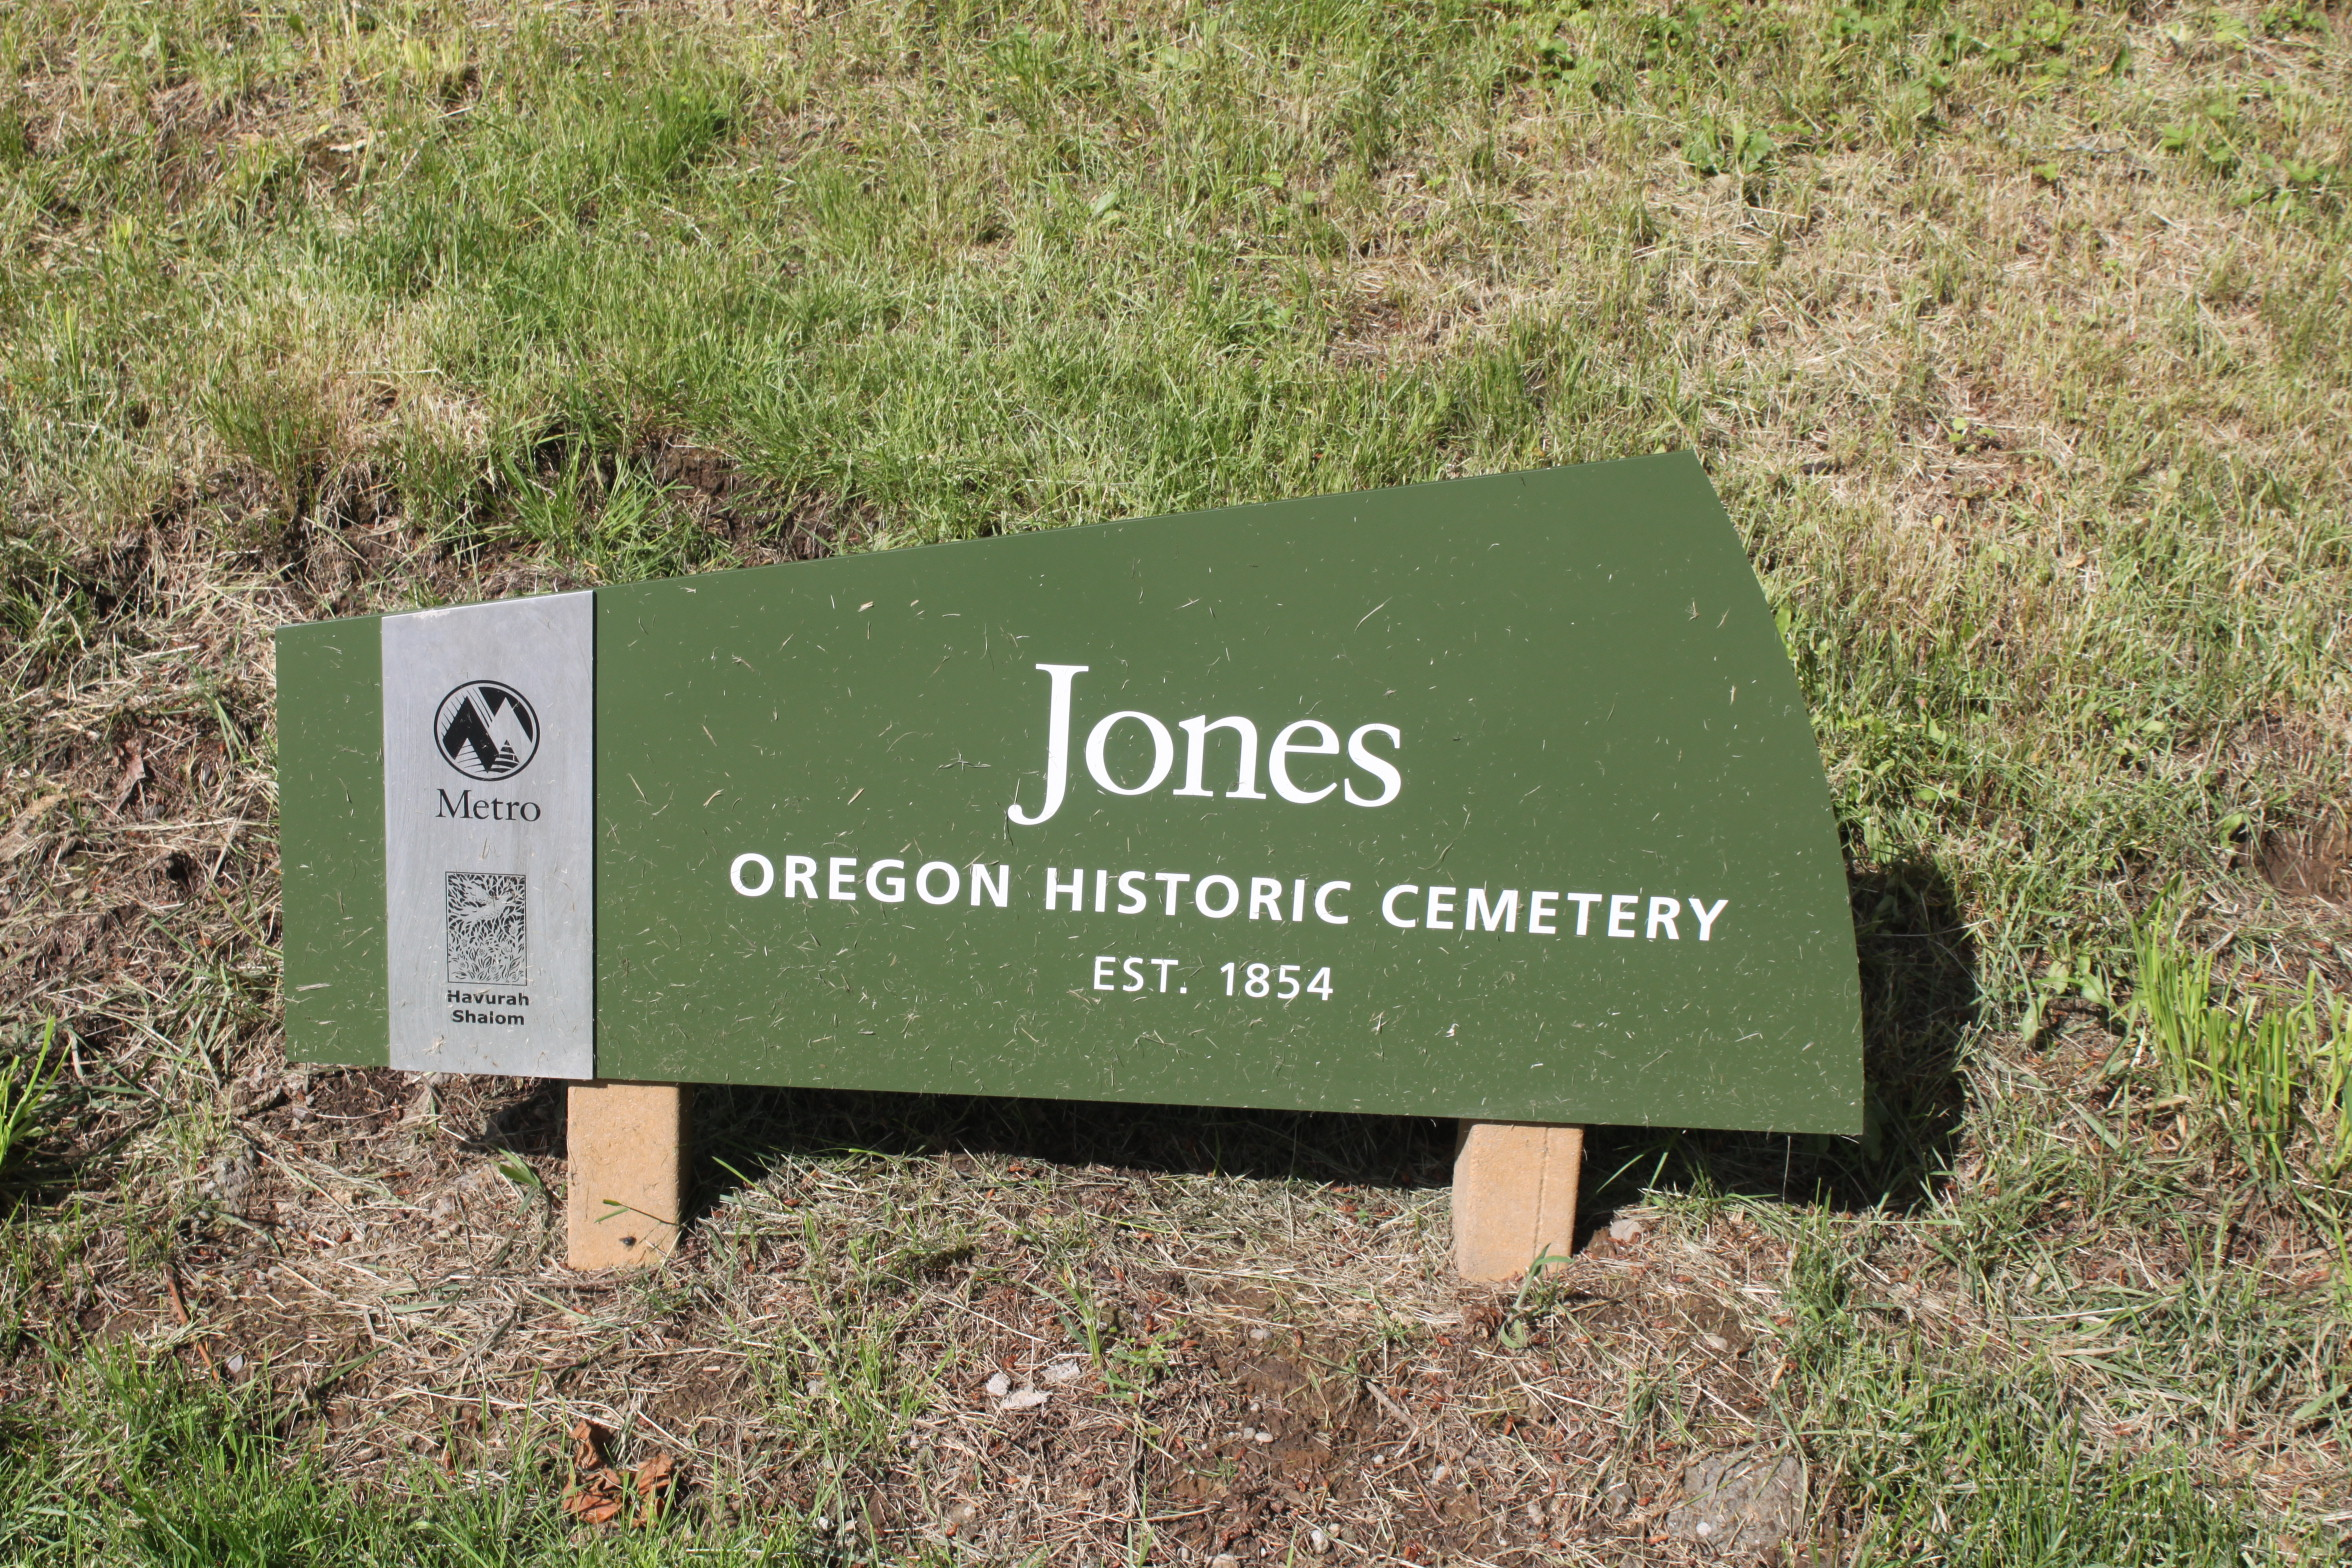 Jones Pioneer Cemetery